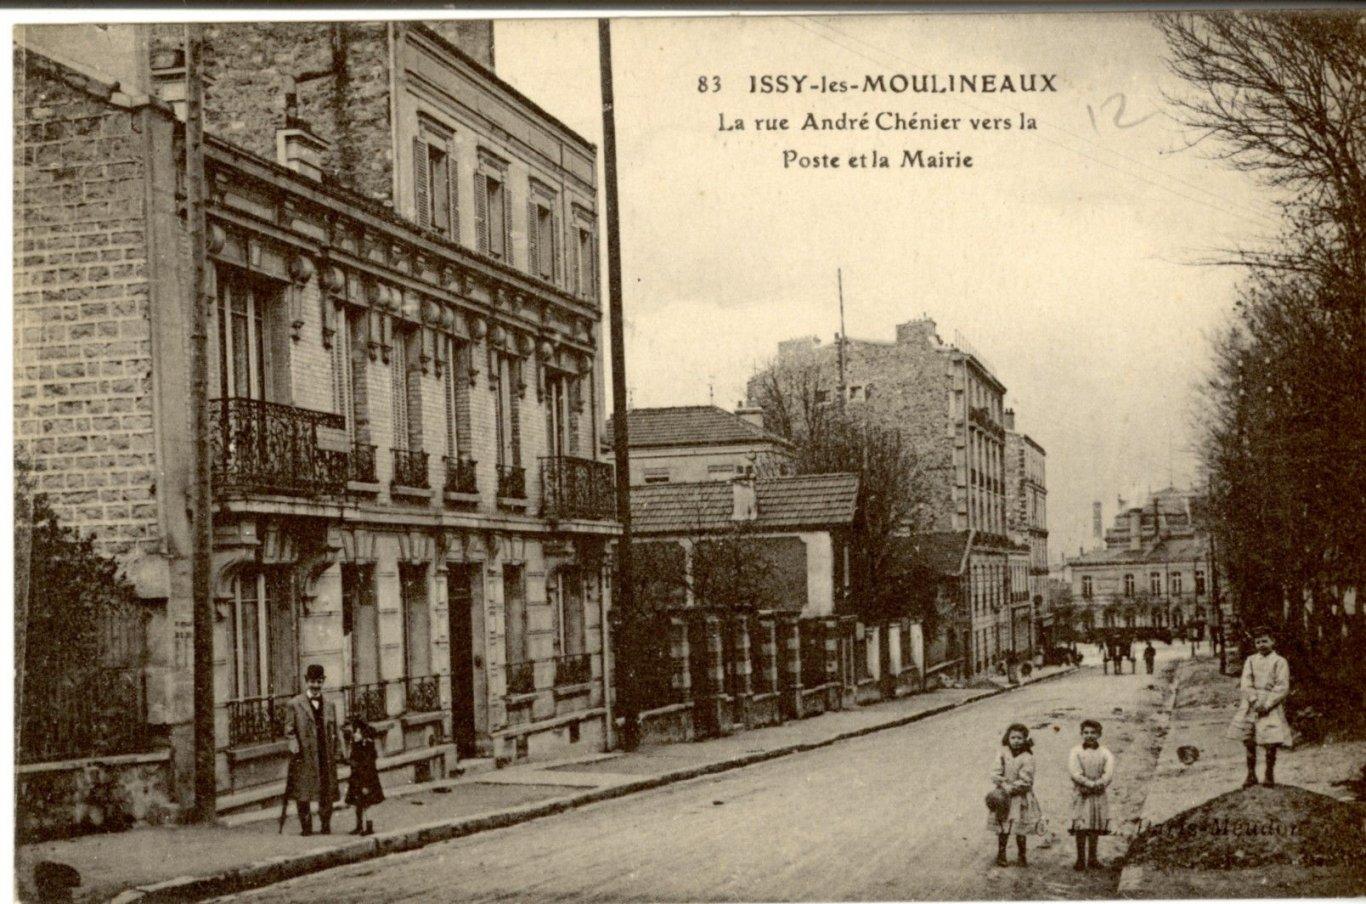 Les Rues Dissy Issy Les Moulineaux